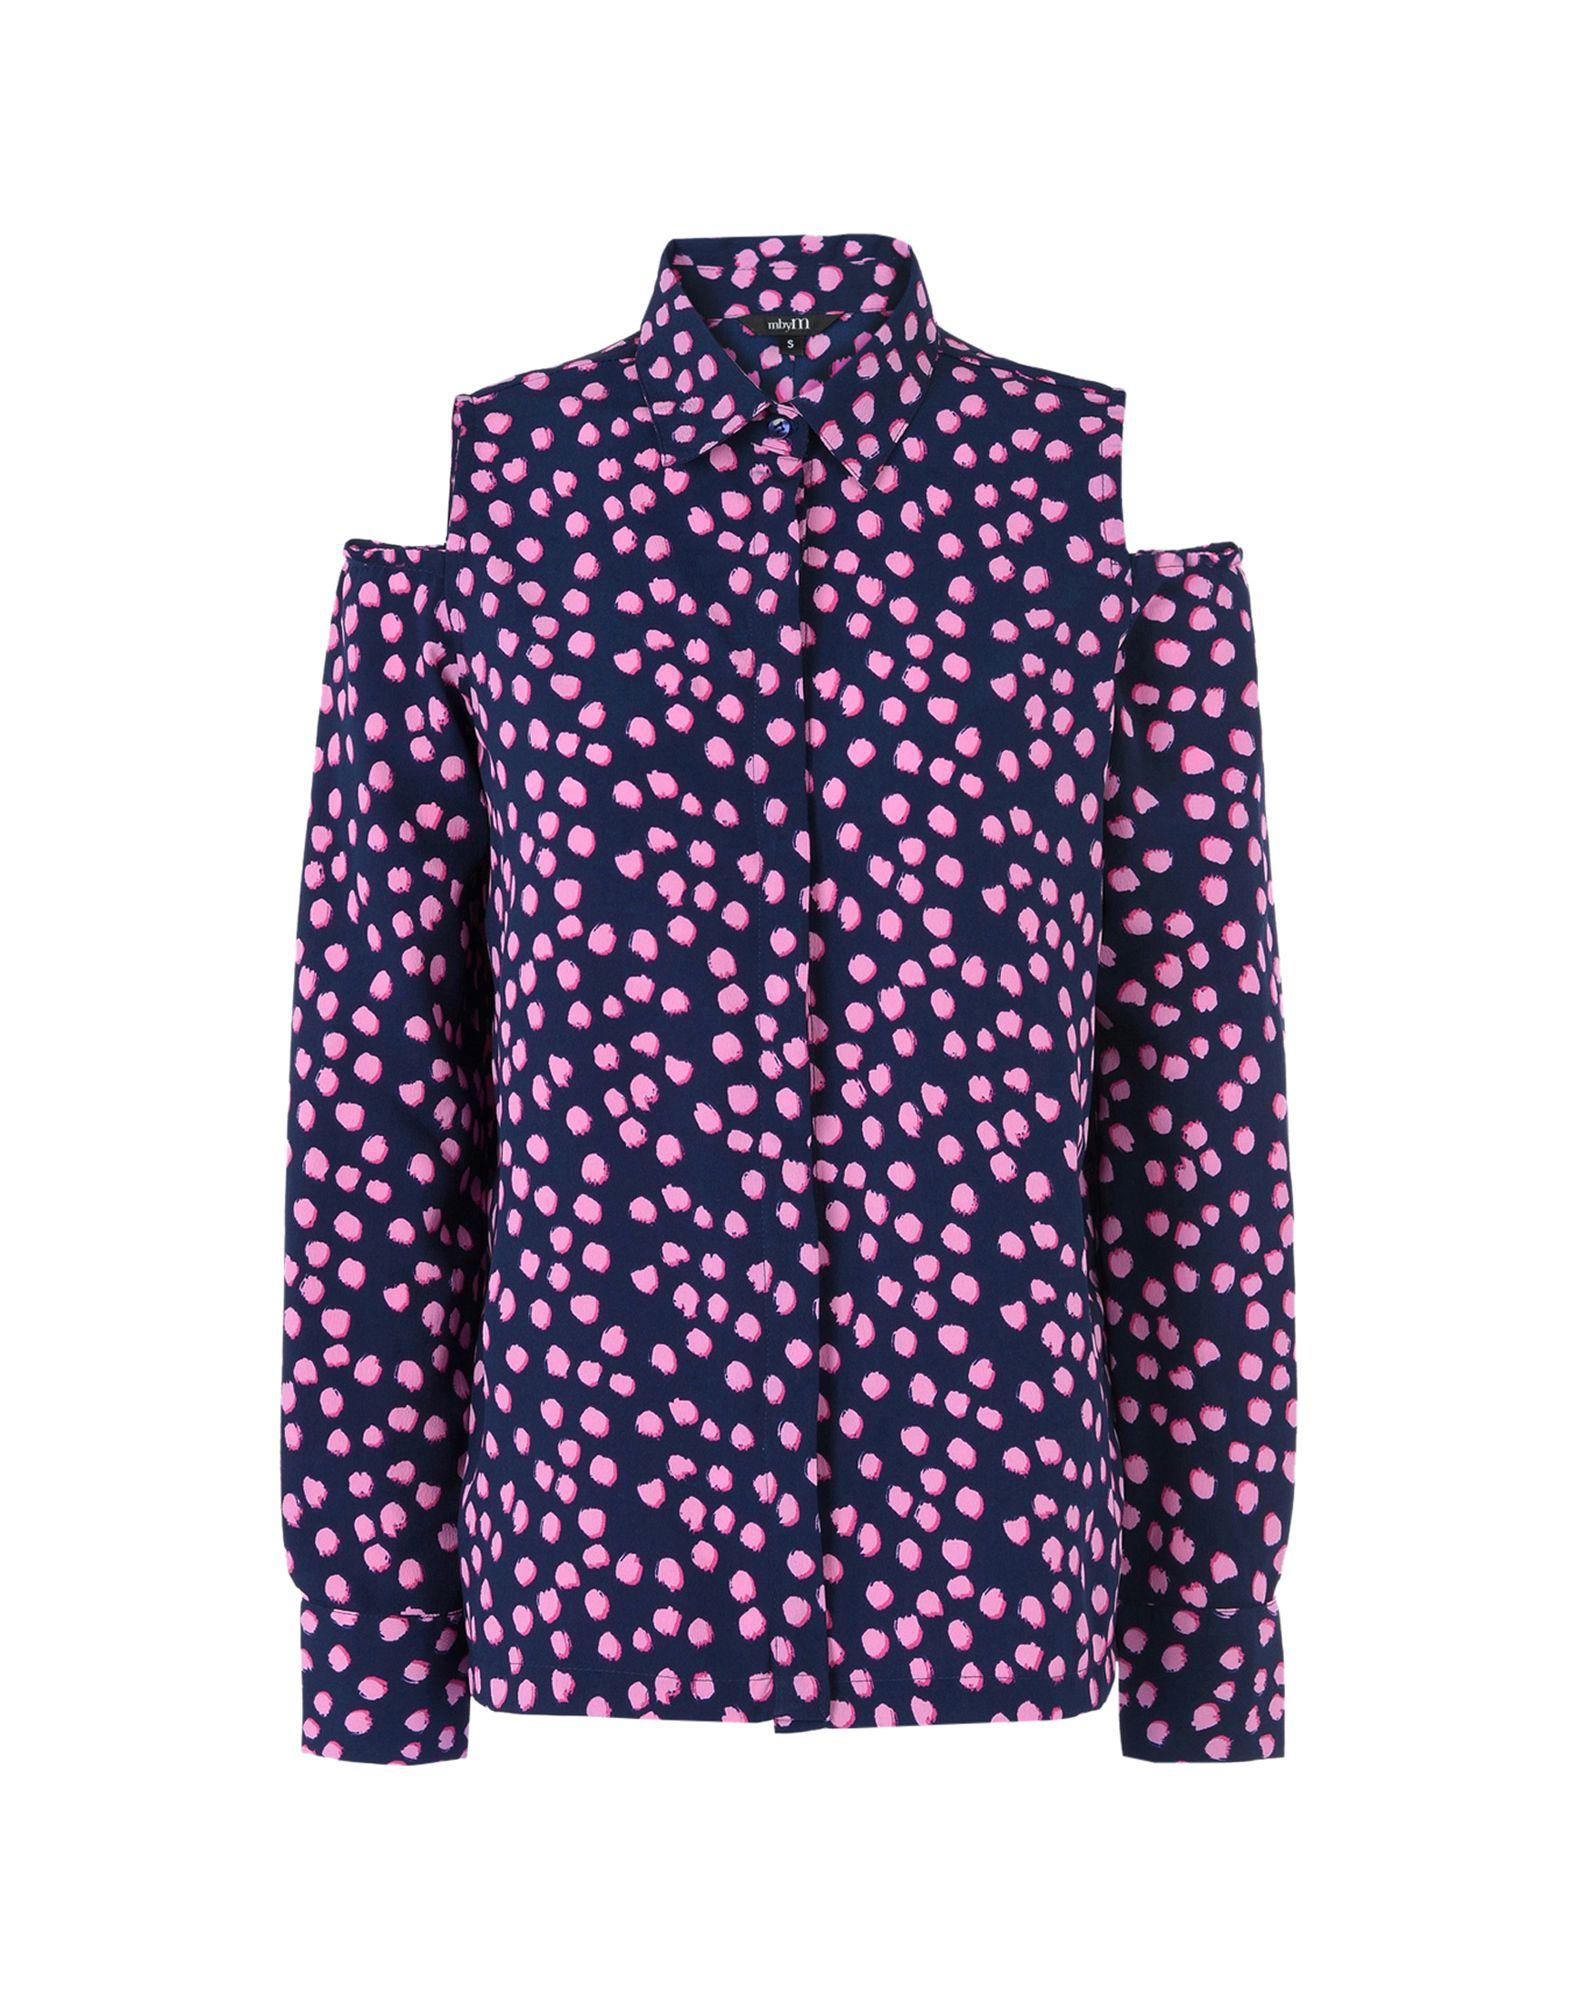 MBYM Patterned Shirts & Blouses in Dark Blue